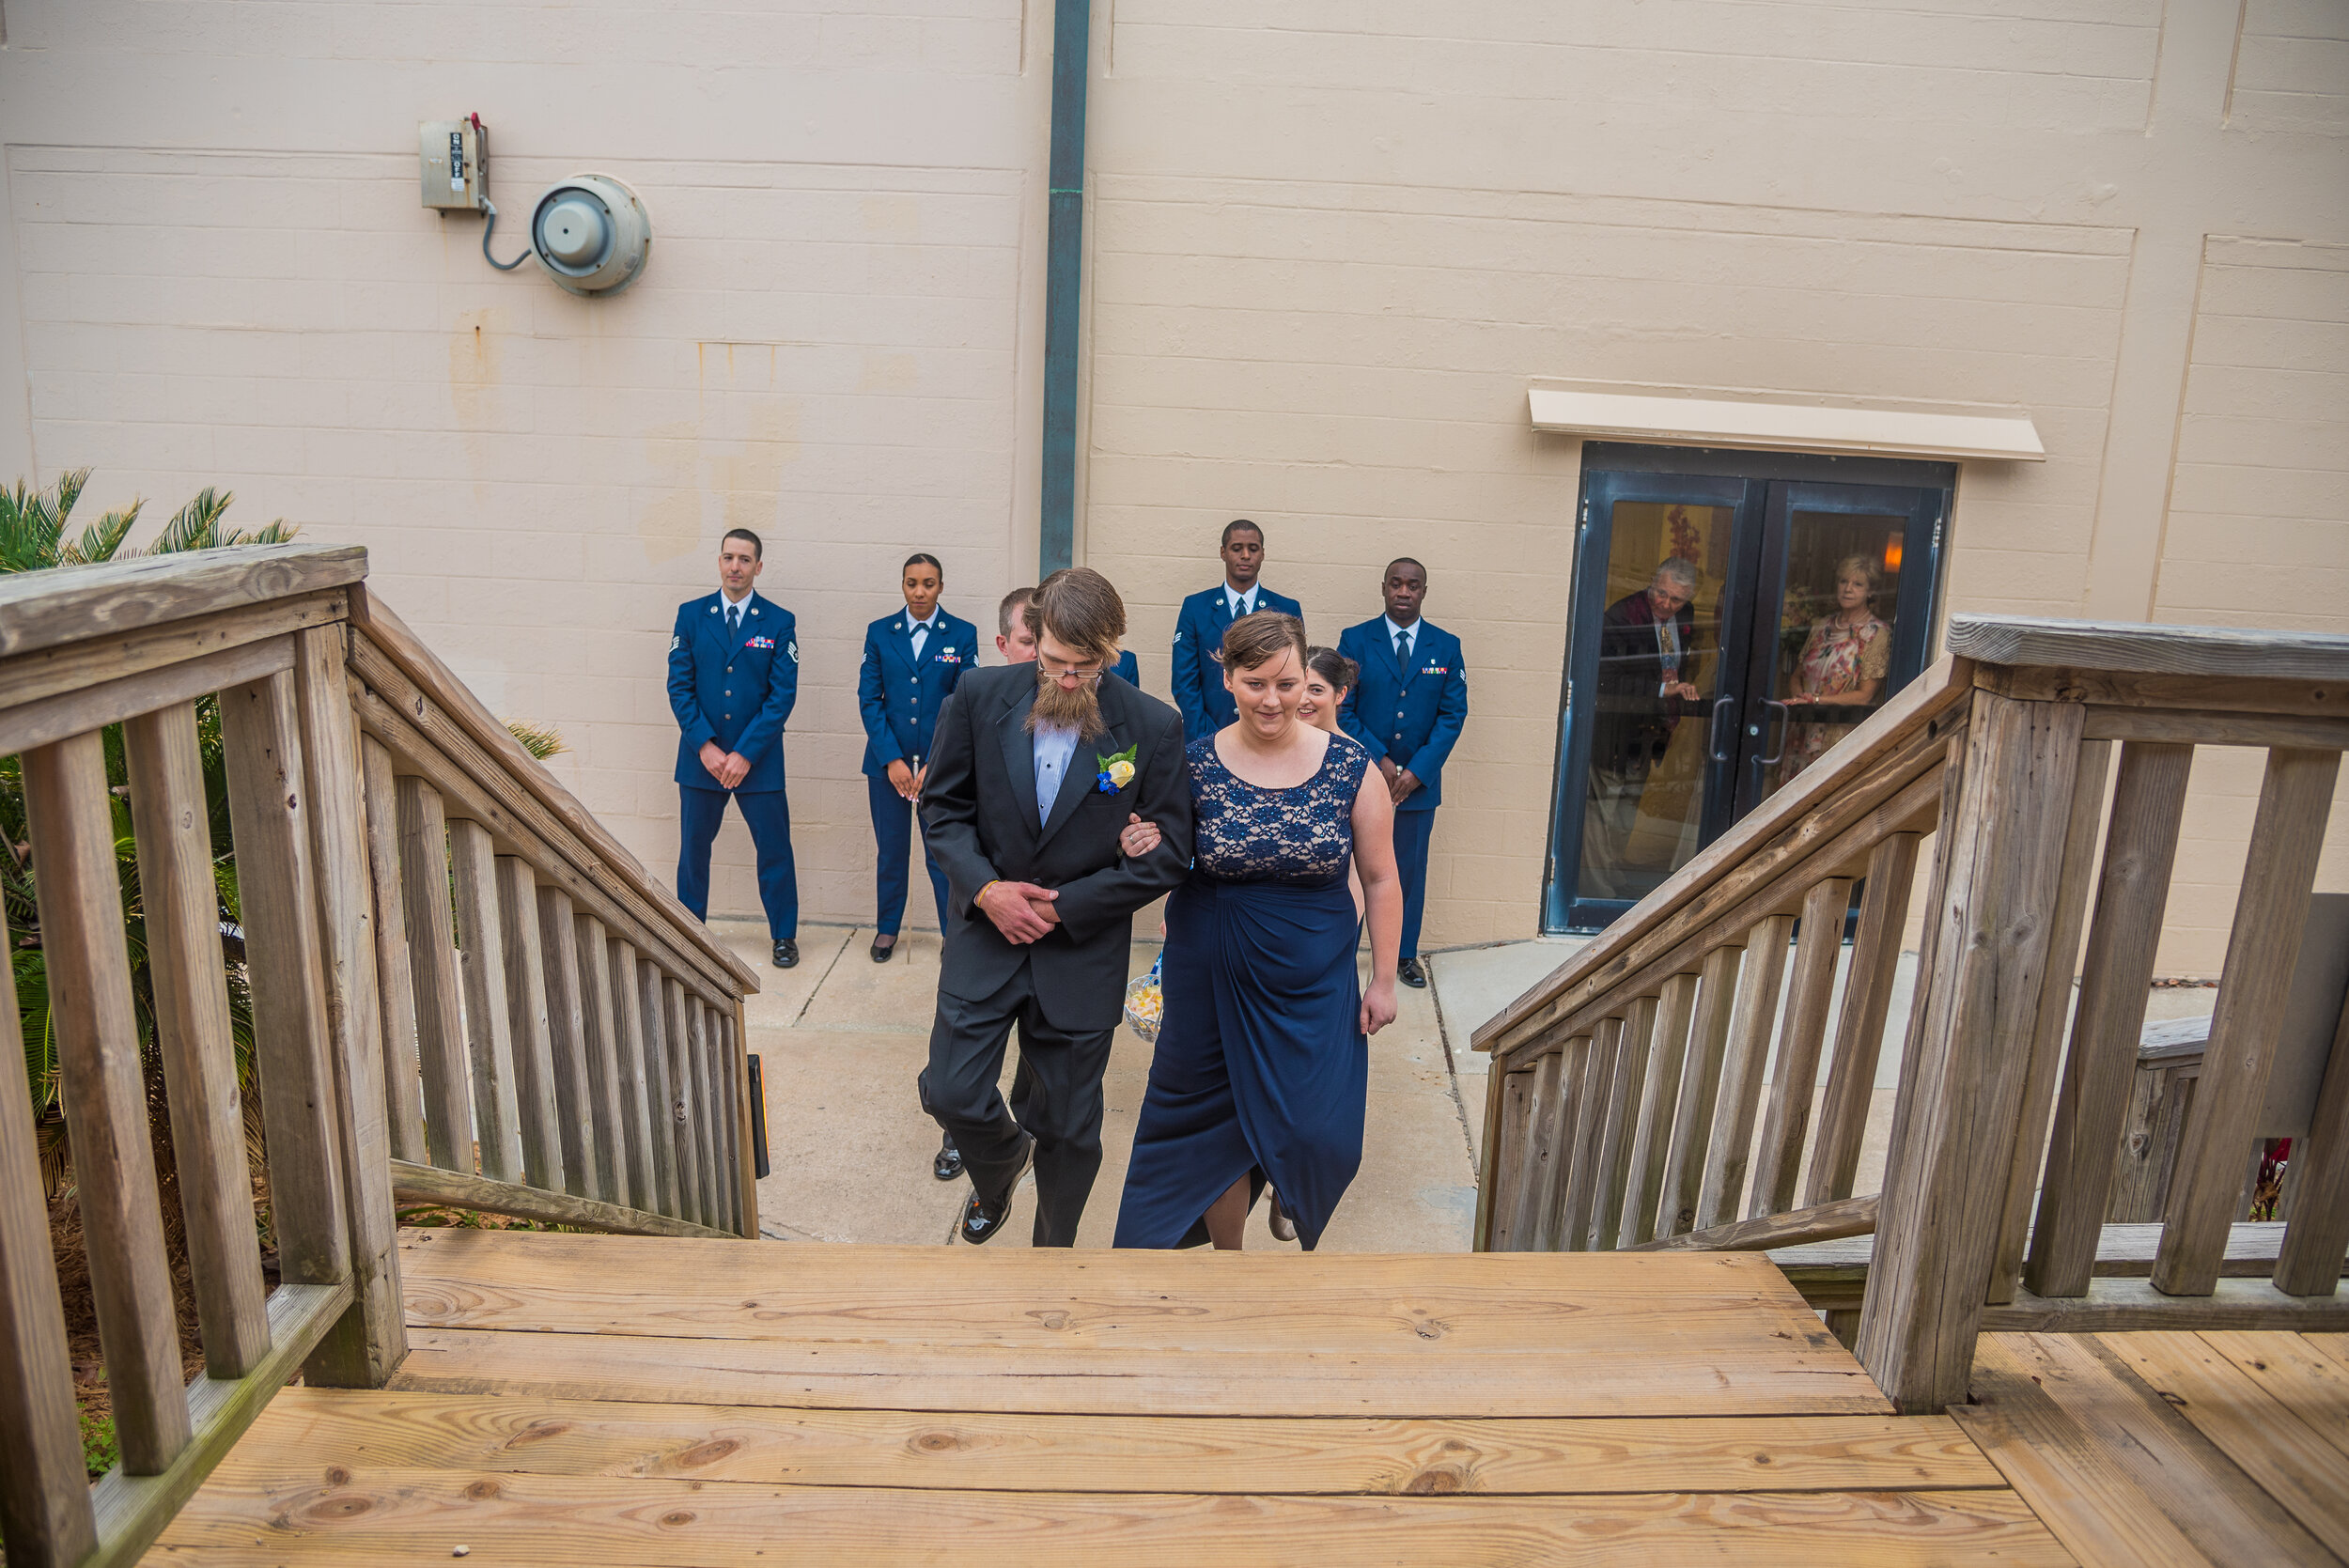 andru-the-tide-club-air-force-wedding-patrickafb-1-19.jpg